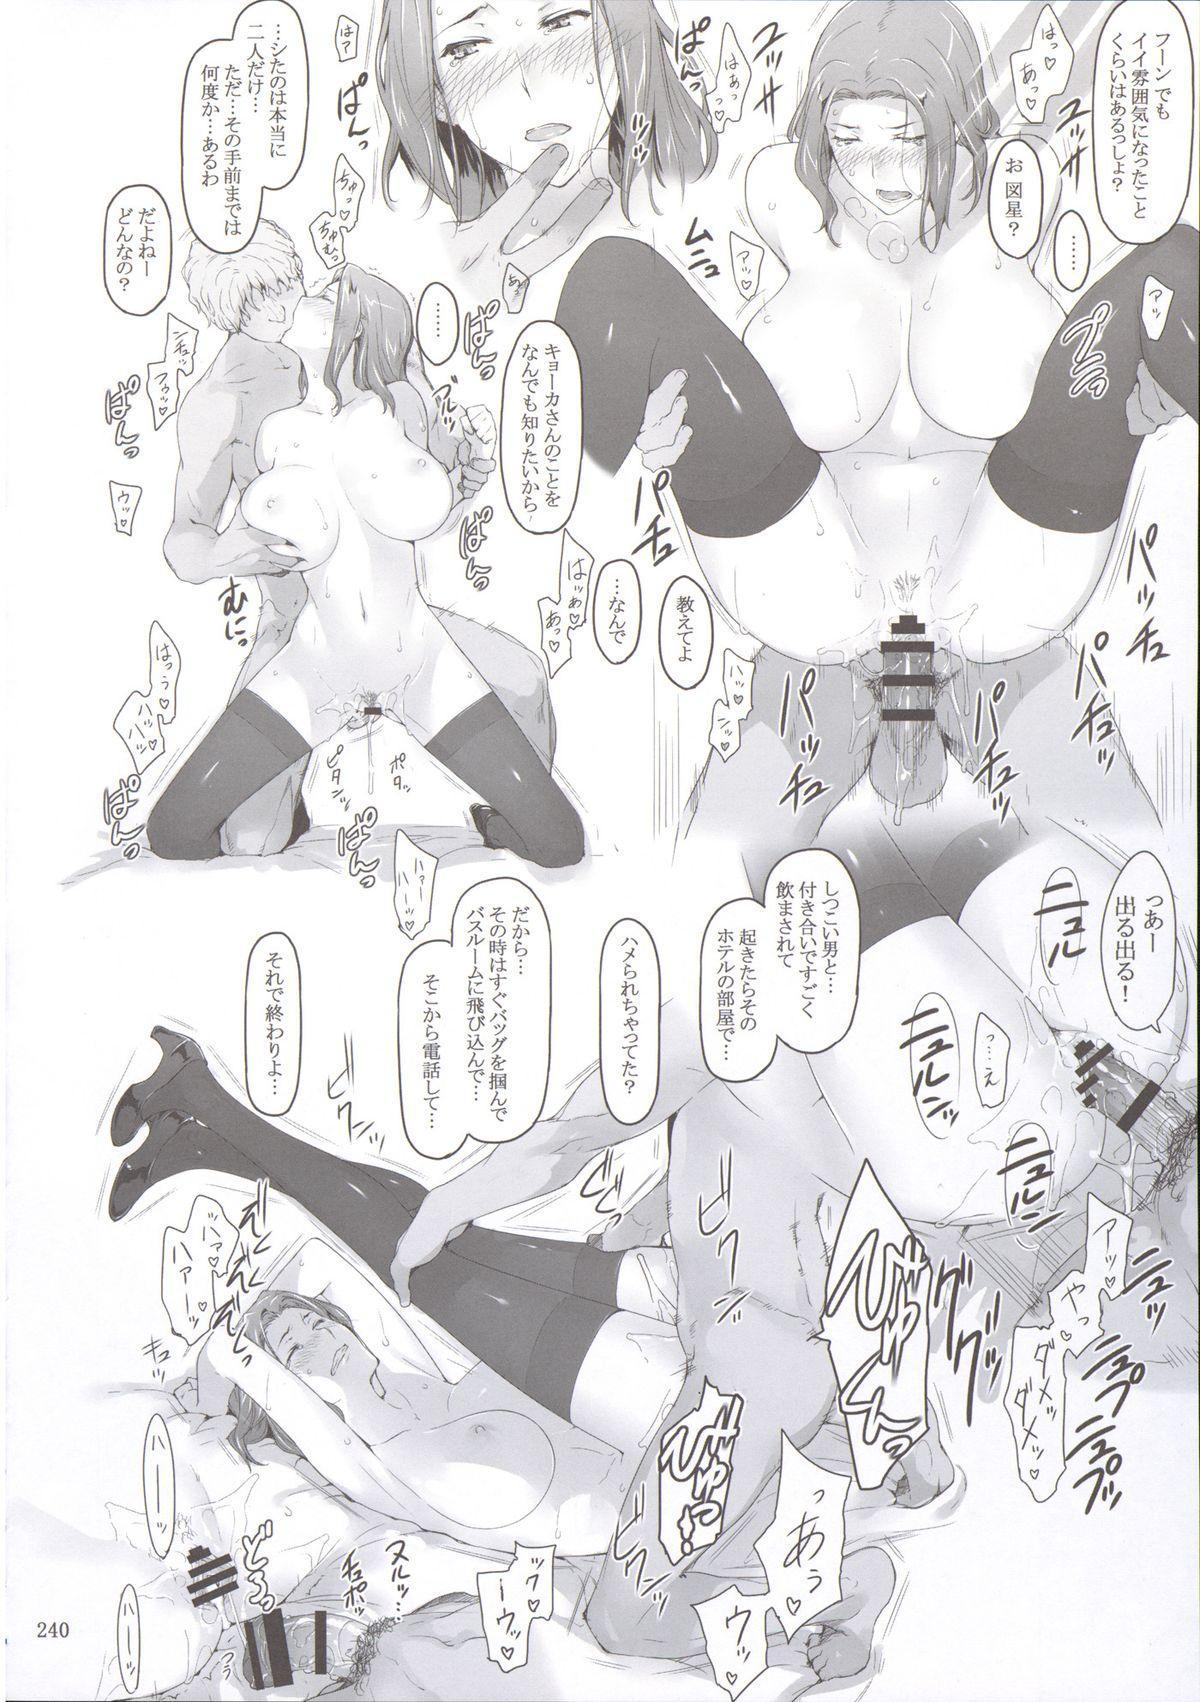 (C86) [MTSP (Jin)] Tachibana-san-chi no Dansei Jijou Matome Ban [Incomplete] 38